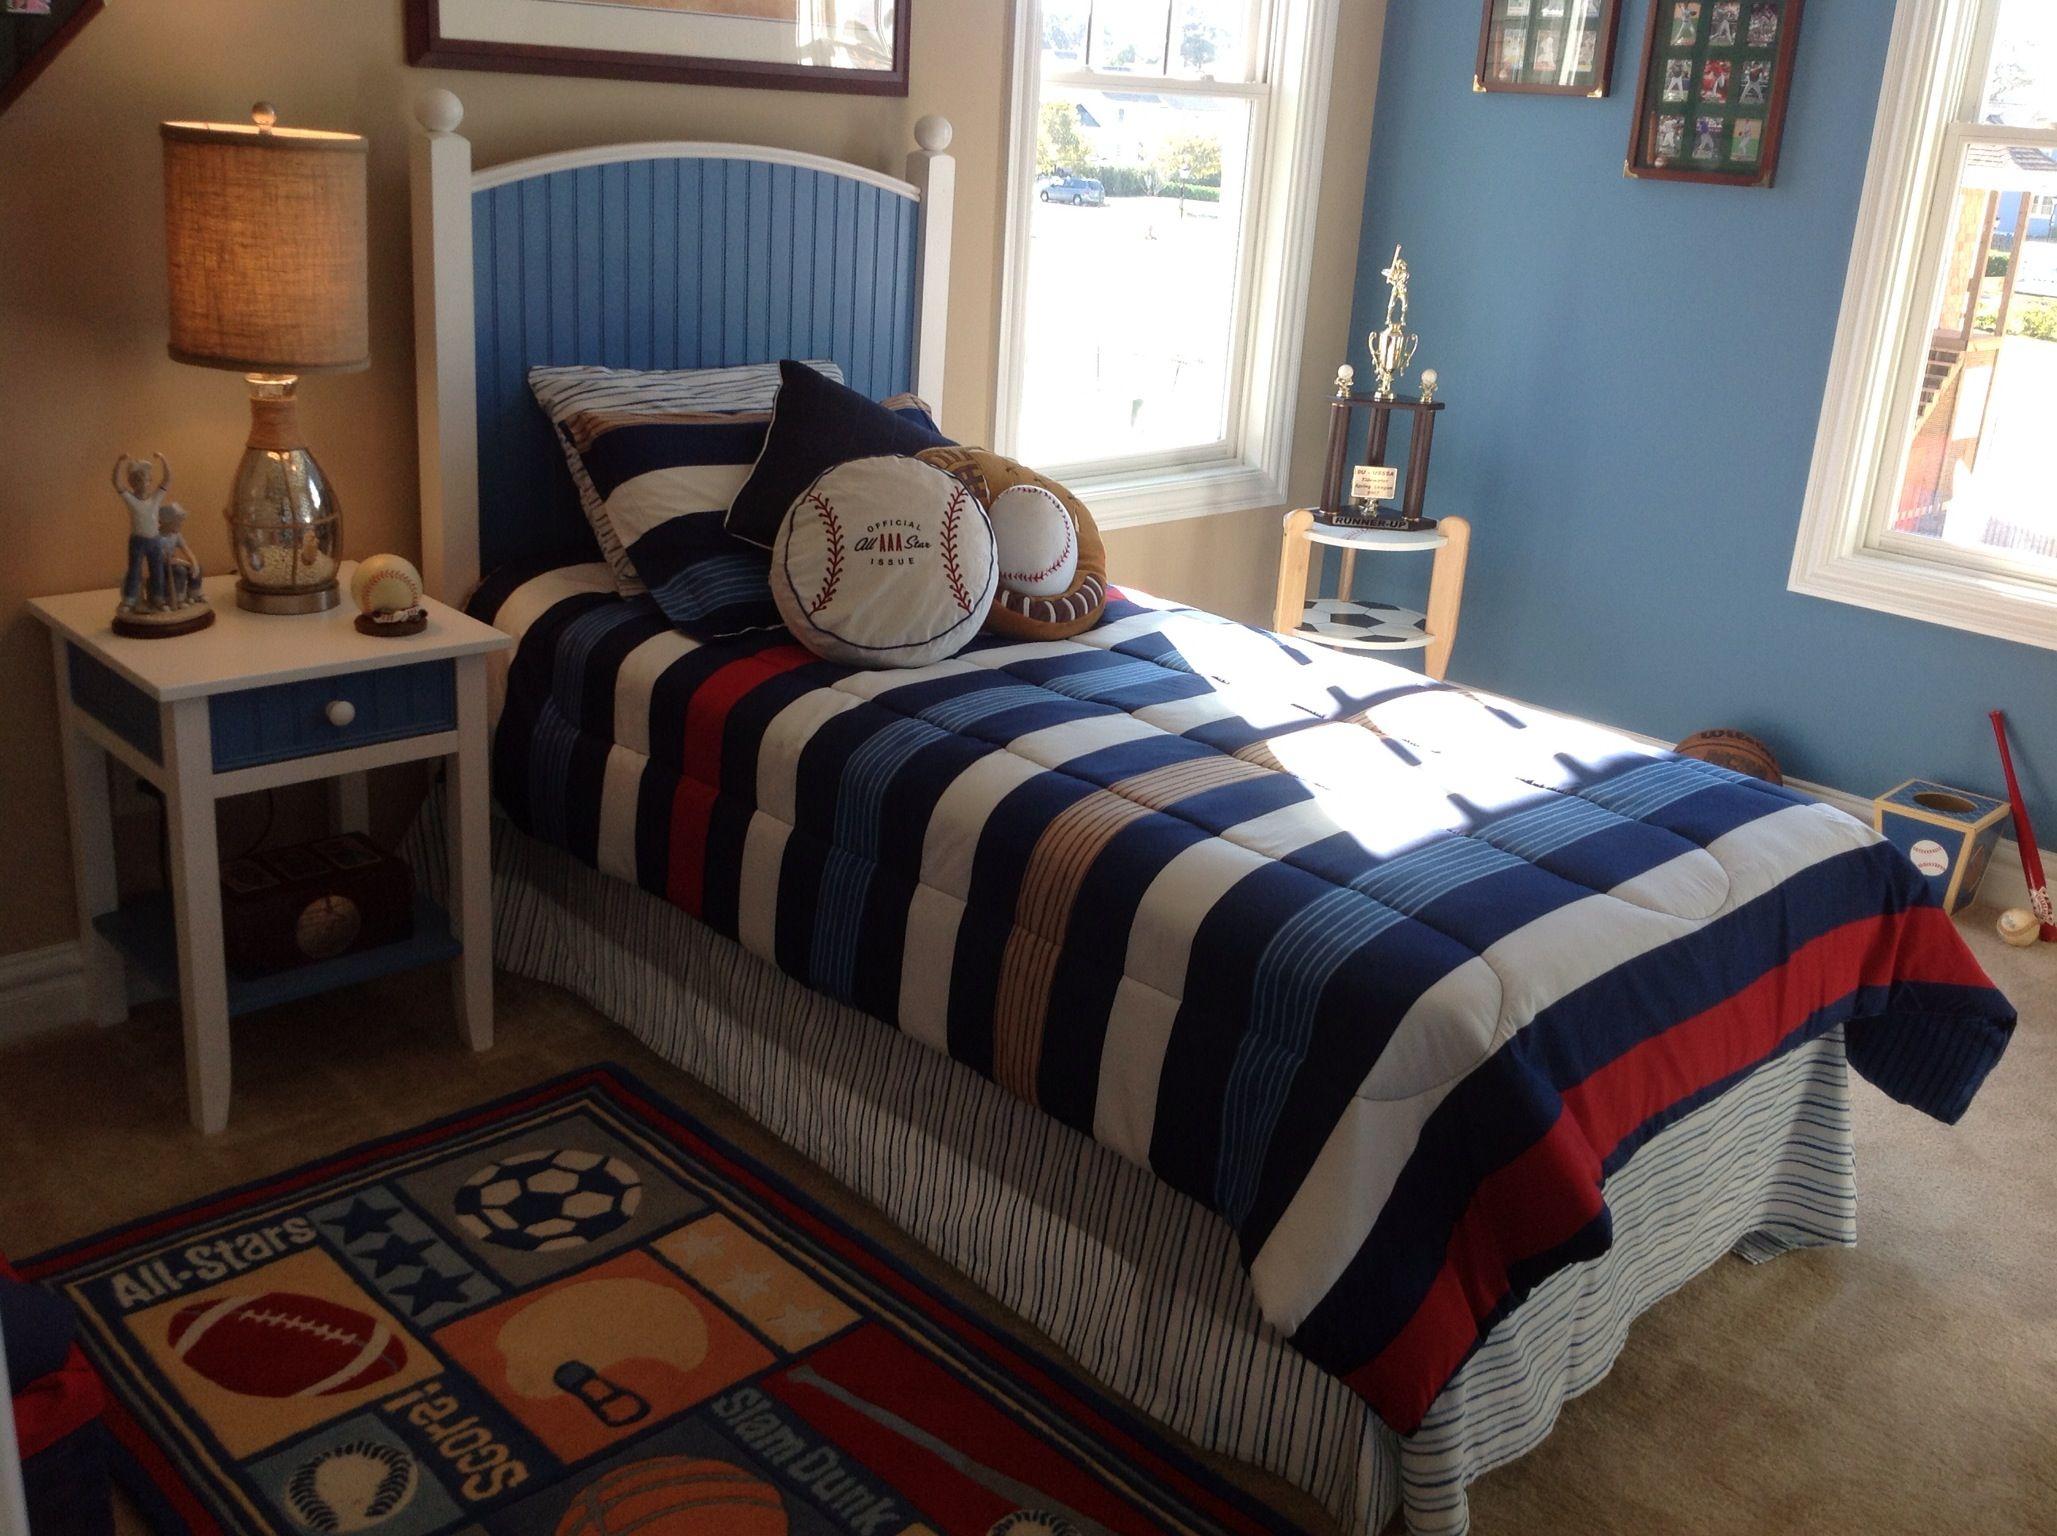 Baseball Theme Bedroom; Furnishings By Heritage Amish Furniture And Great  Bridge Furniture